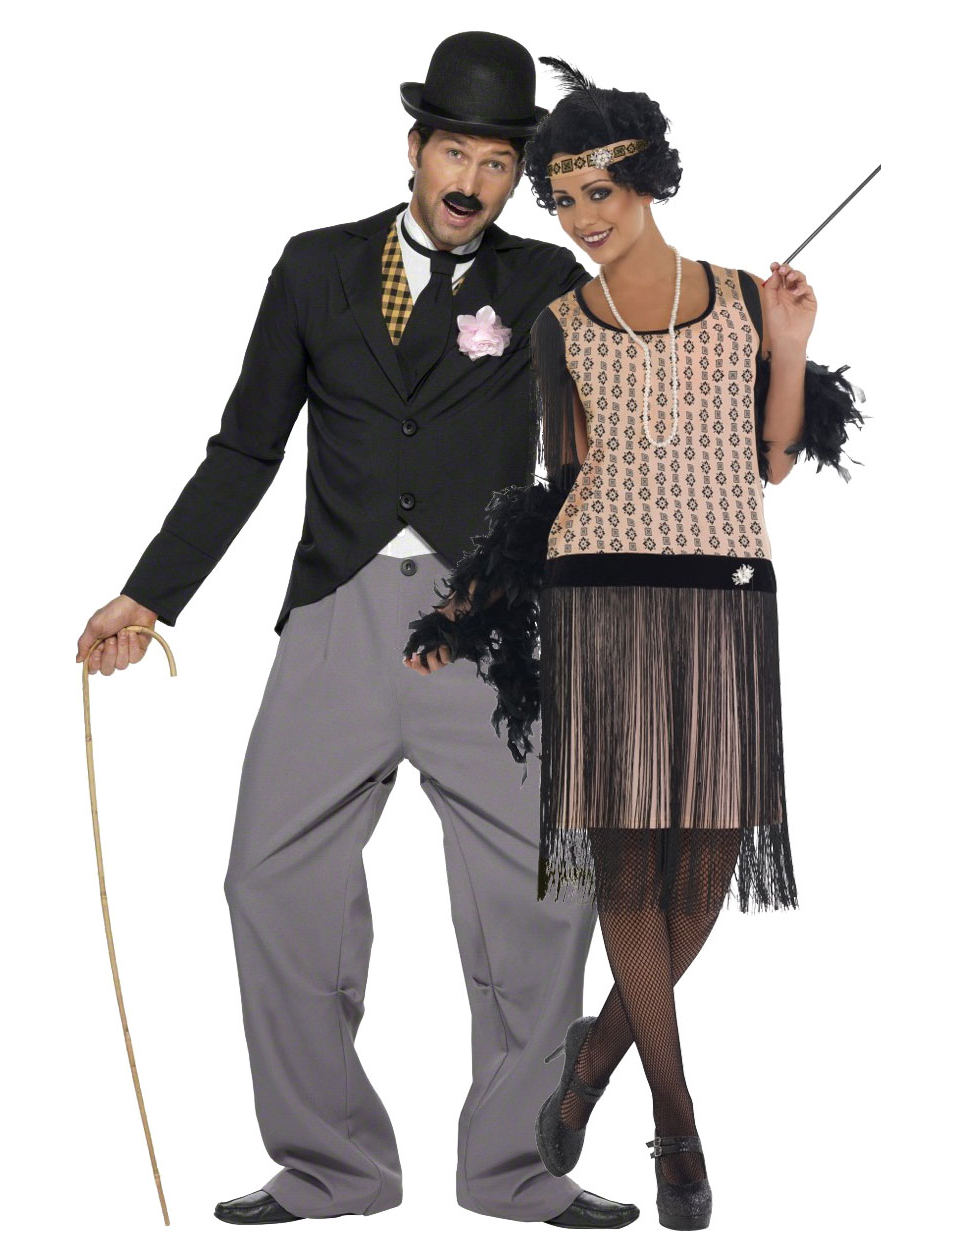 disfraz pareja charlest n disfraces parejas y disfraces originales baratos vegaoo. Black Bedroom Furniture Sets. Home Design Ideas